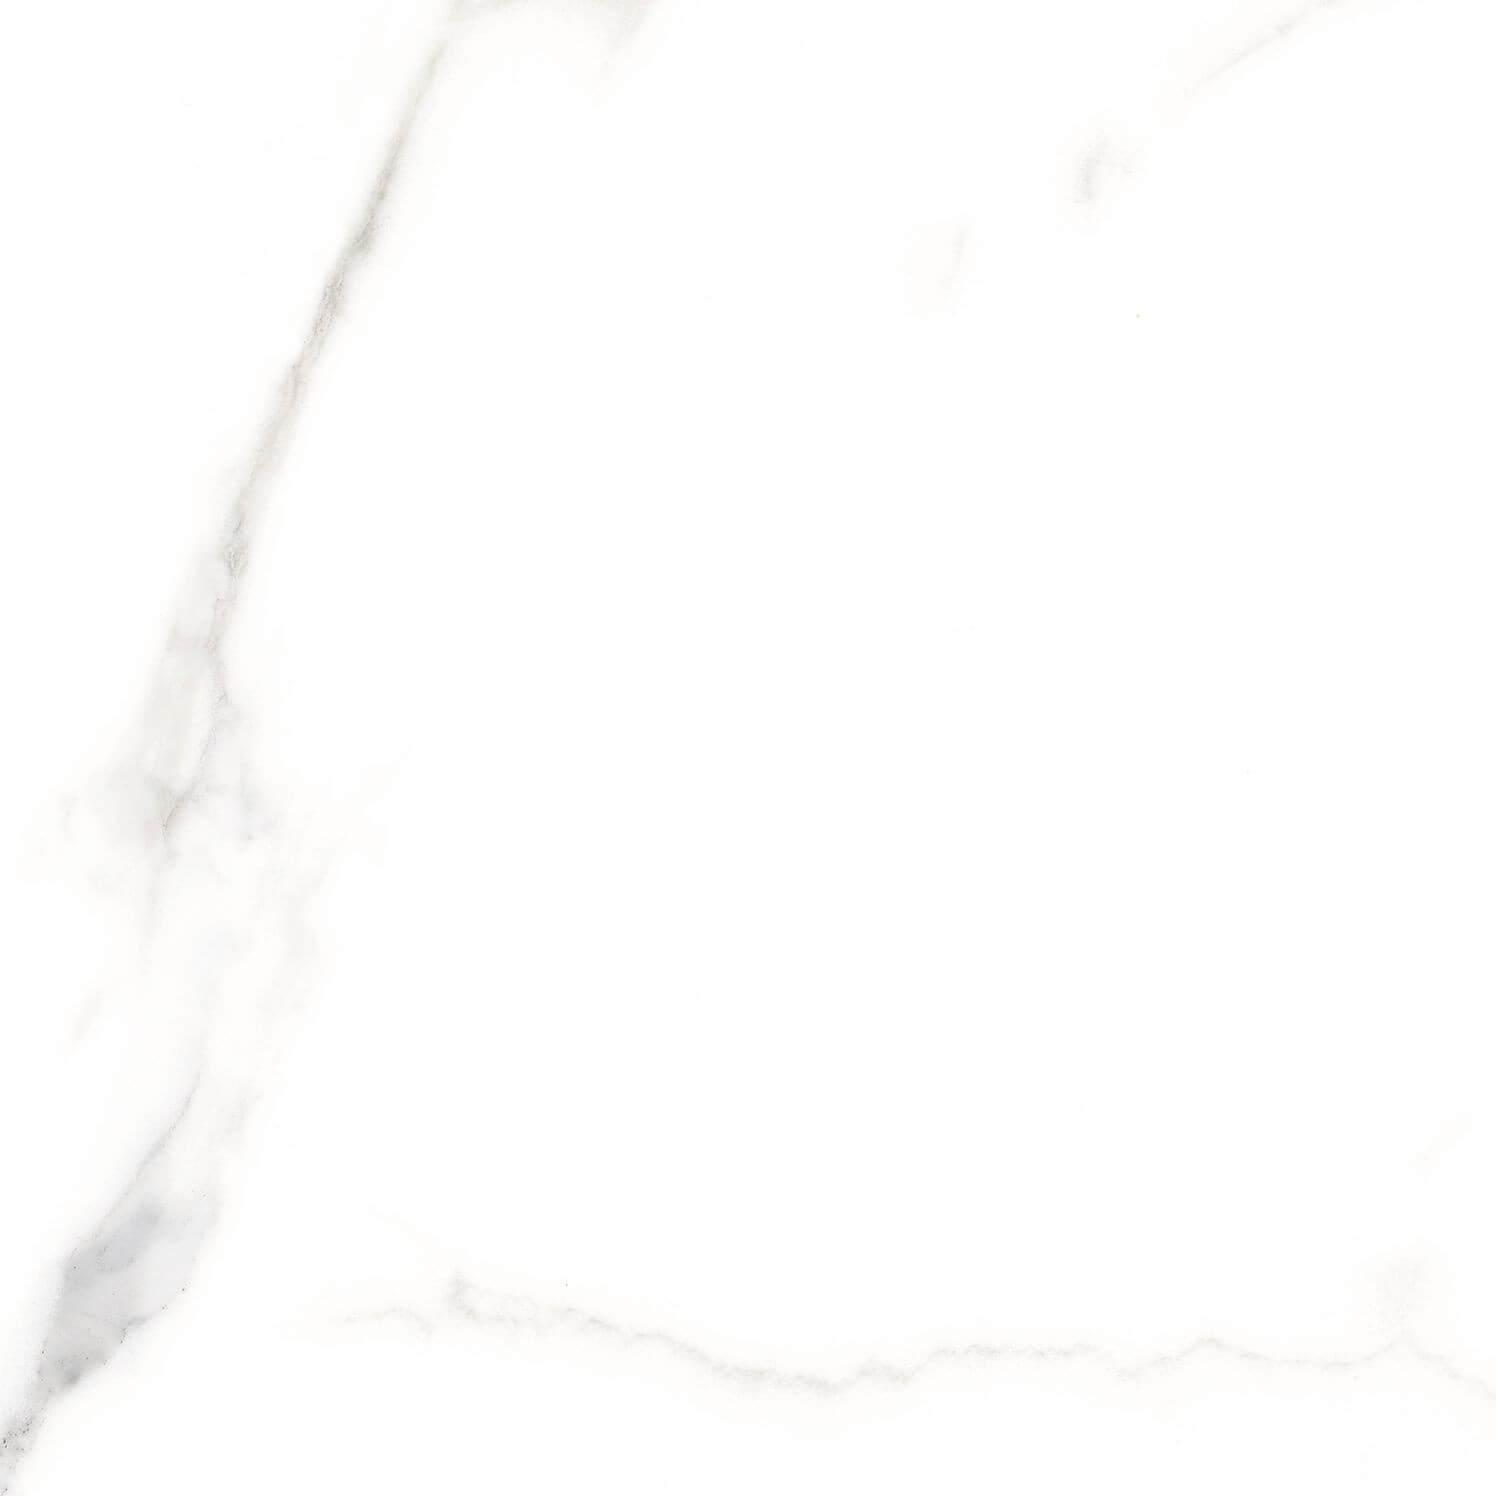 Carrelage sol et mur aspect marbre blanc mat Terni Blanco 25x25 cm